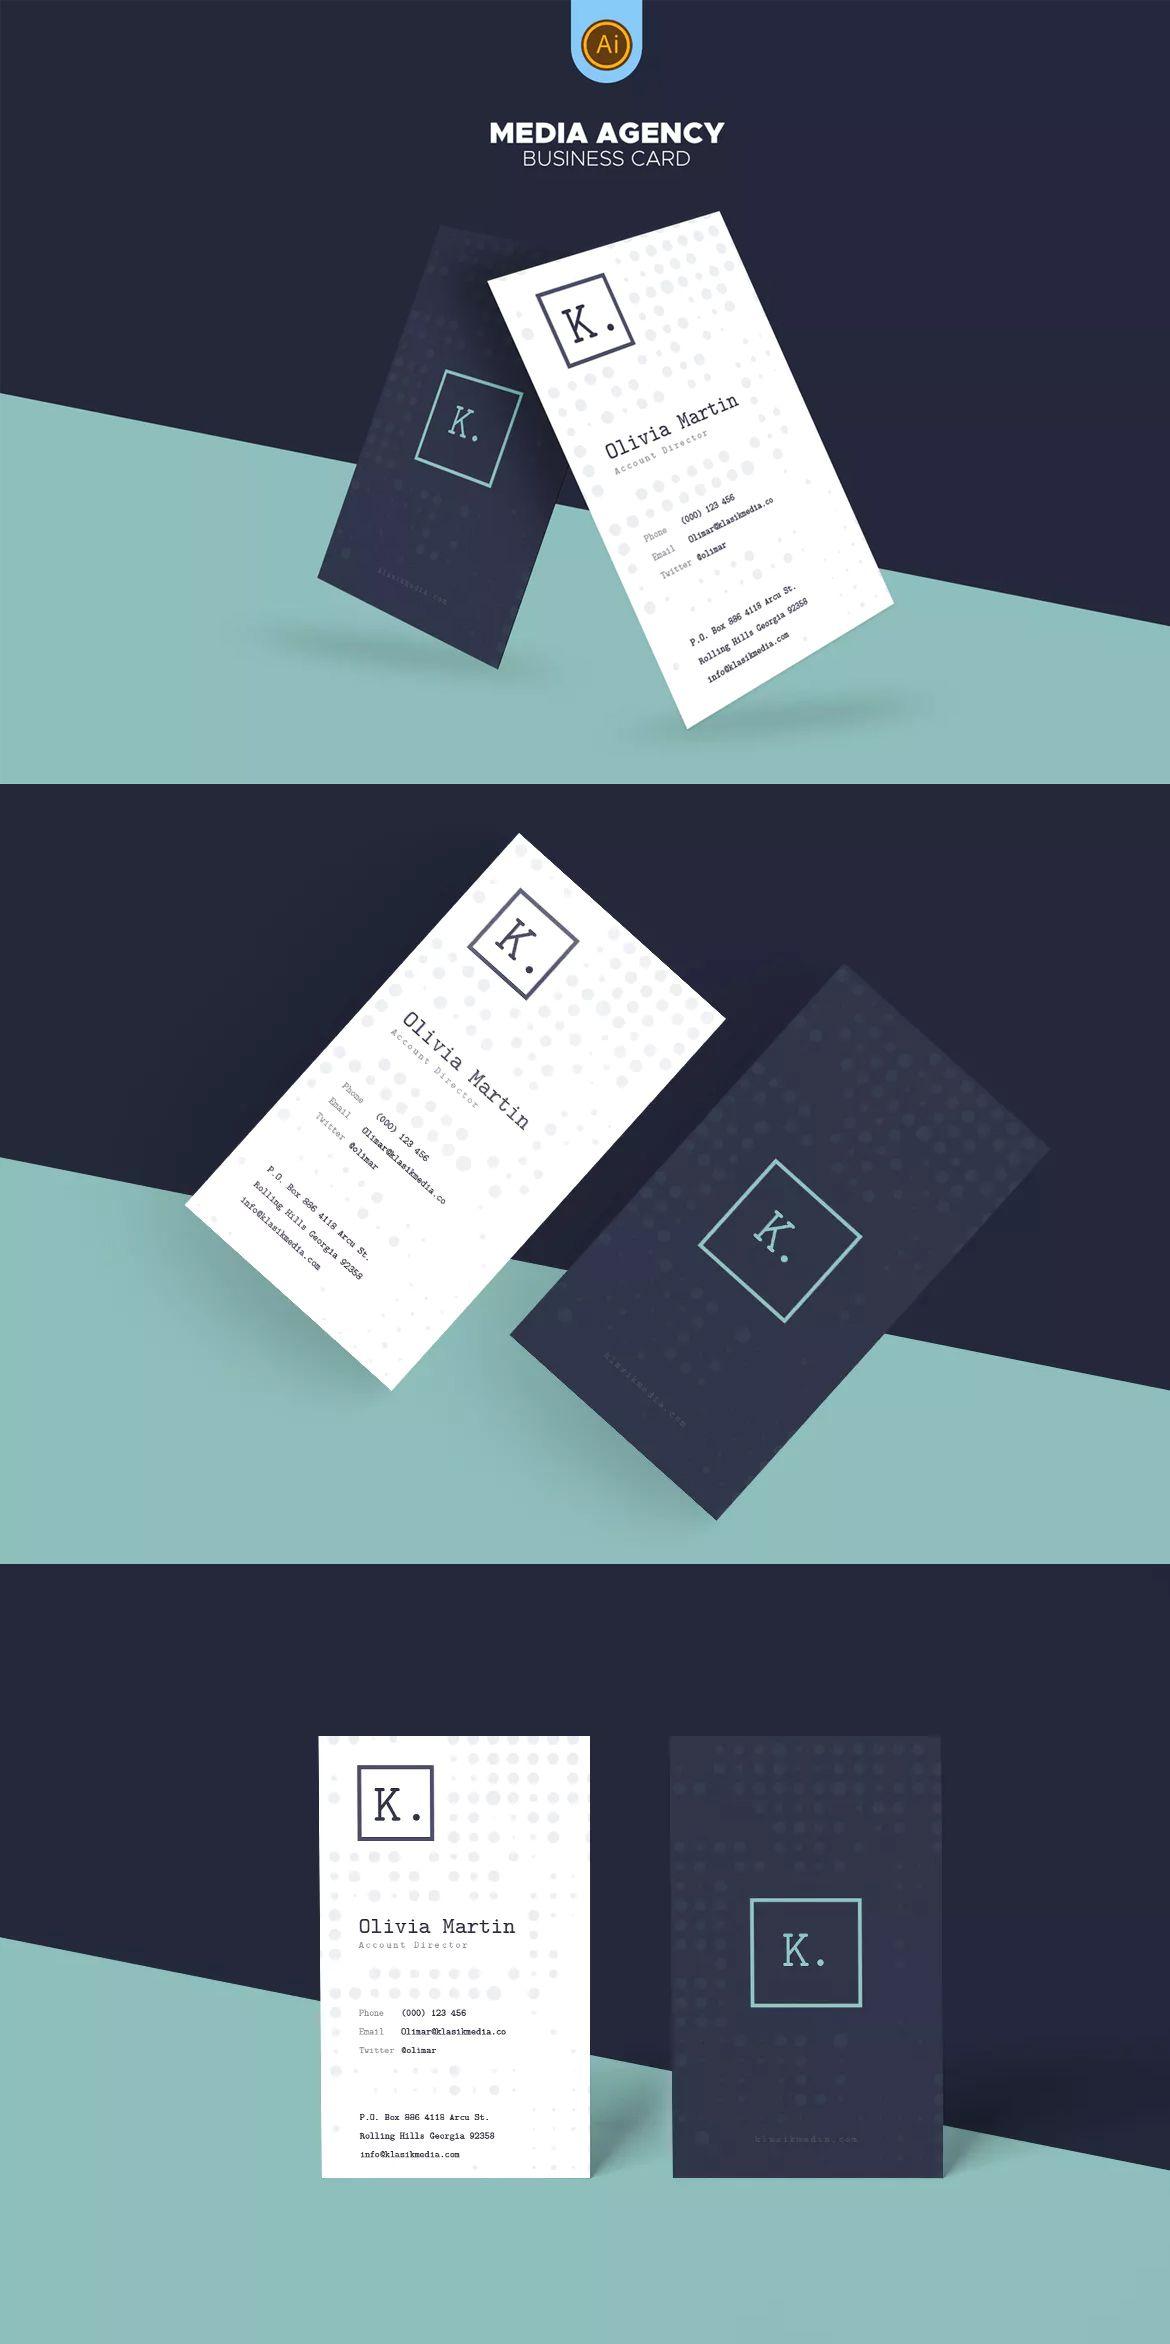 Media Agency Business Card Template Ai Eps Dizajn Business